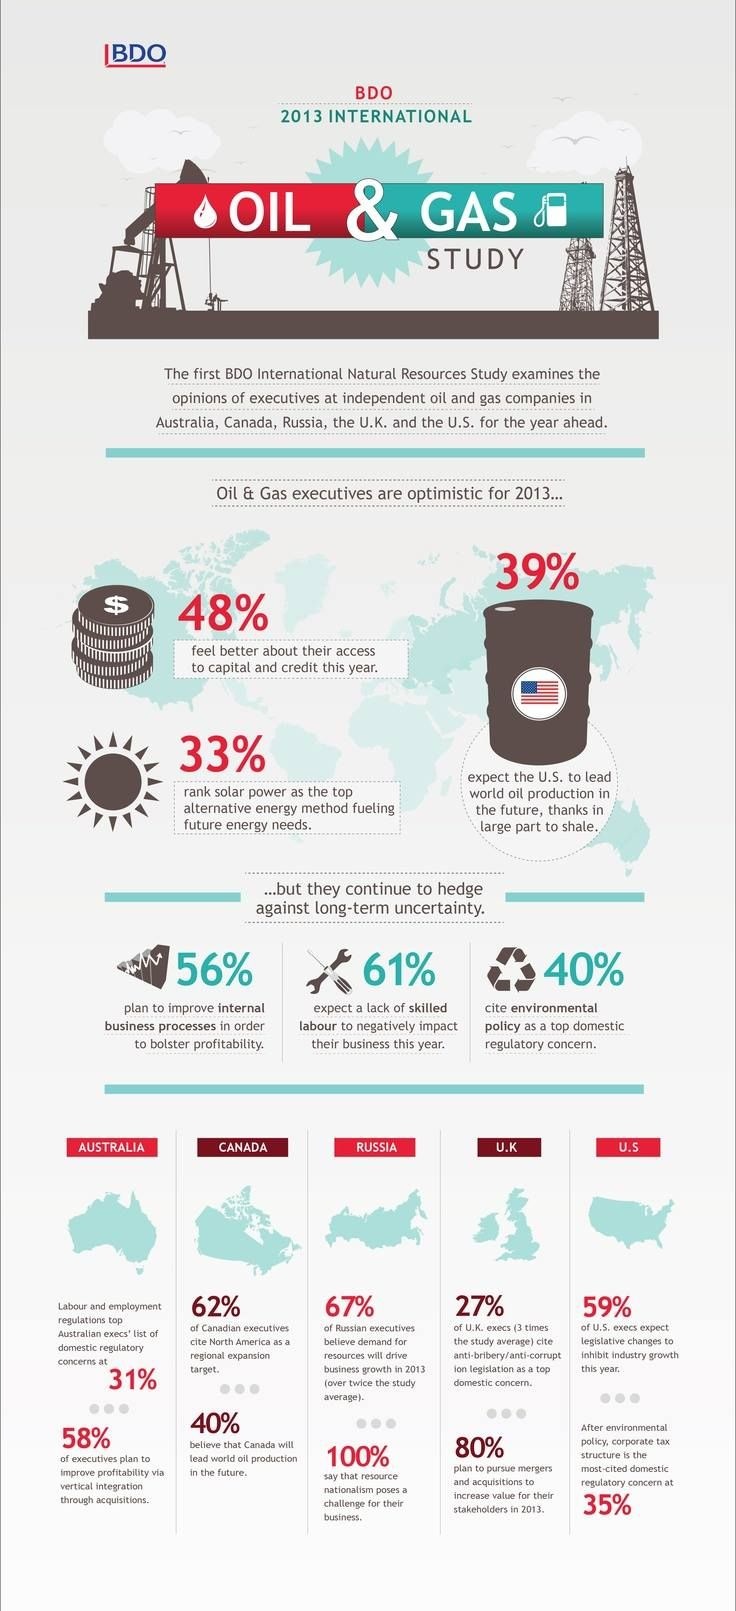 2013 International Oil and Gas Study - BDO